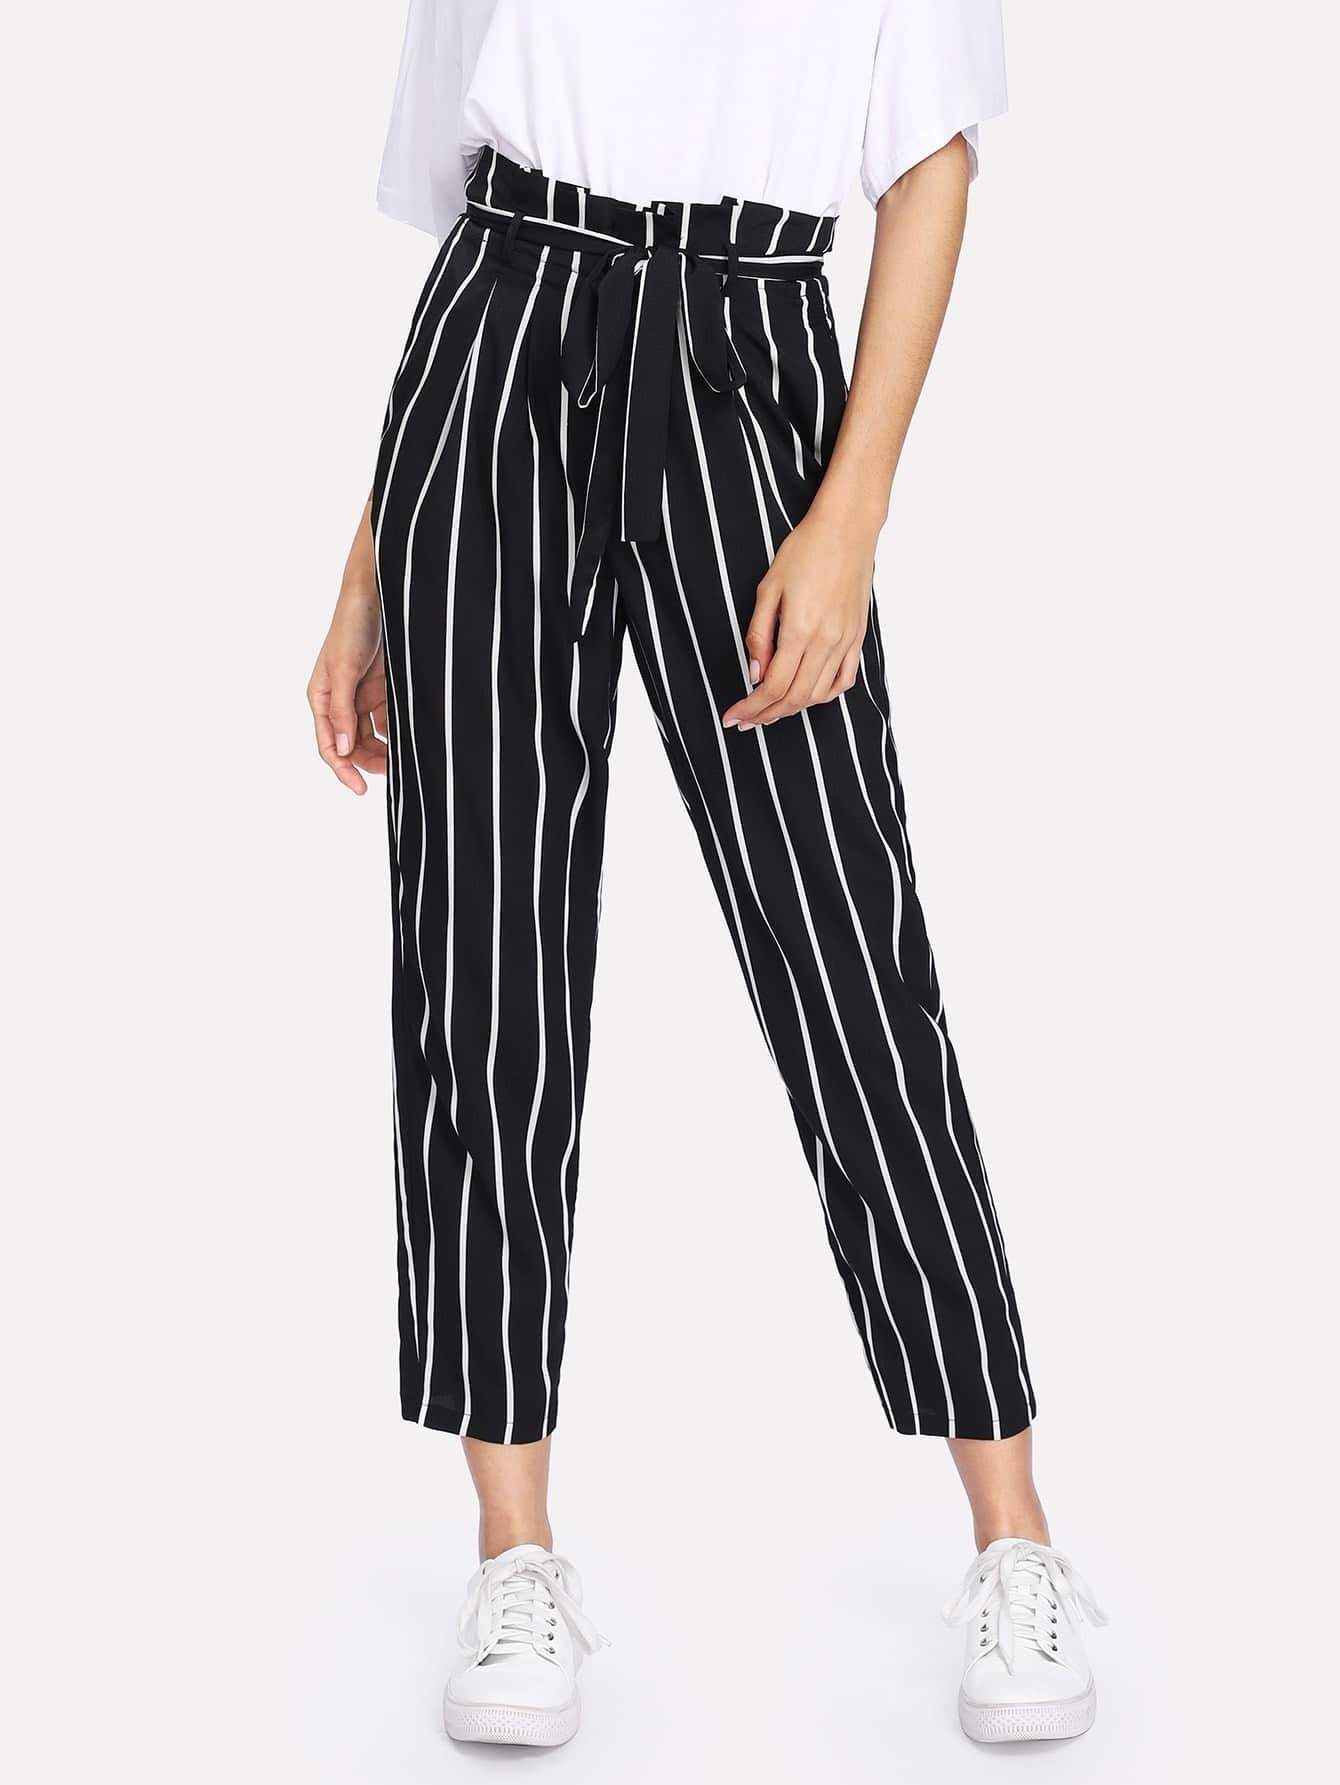 Image of Self Belt Striped Pants